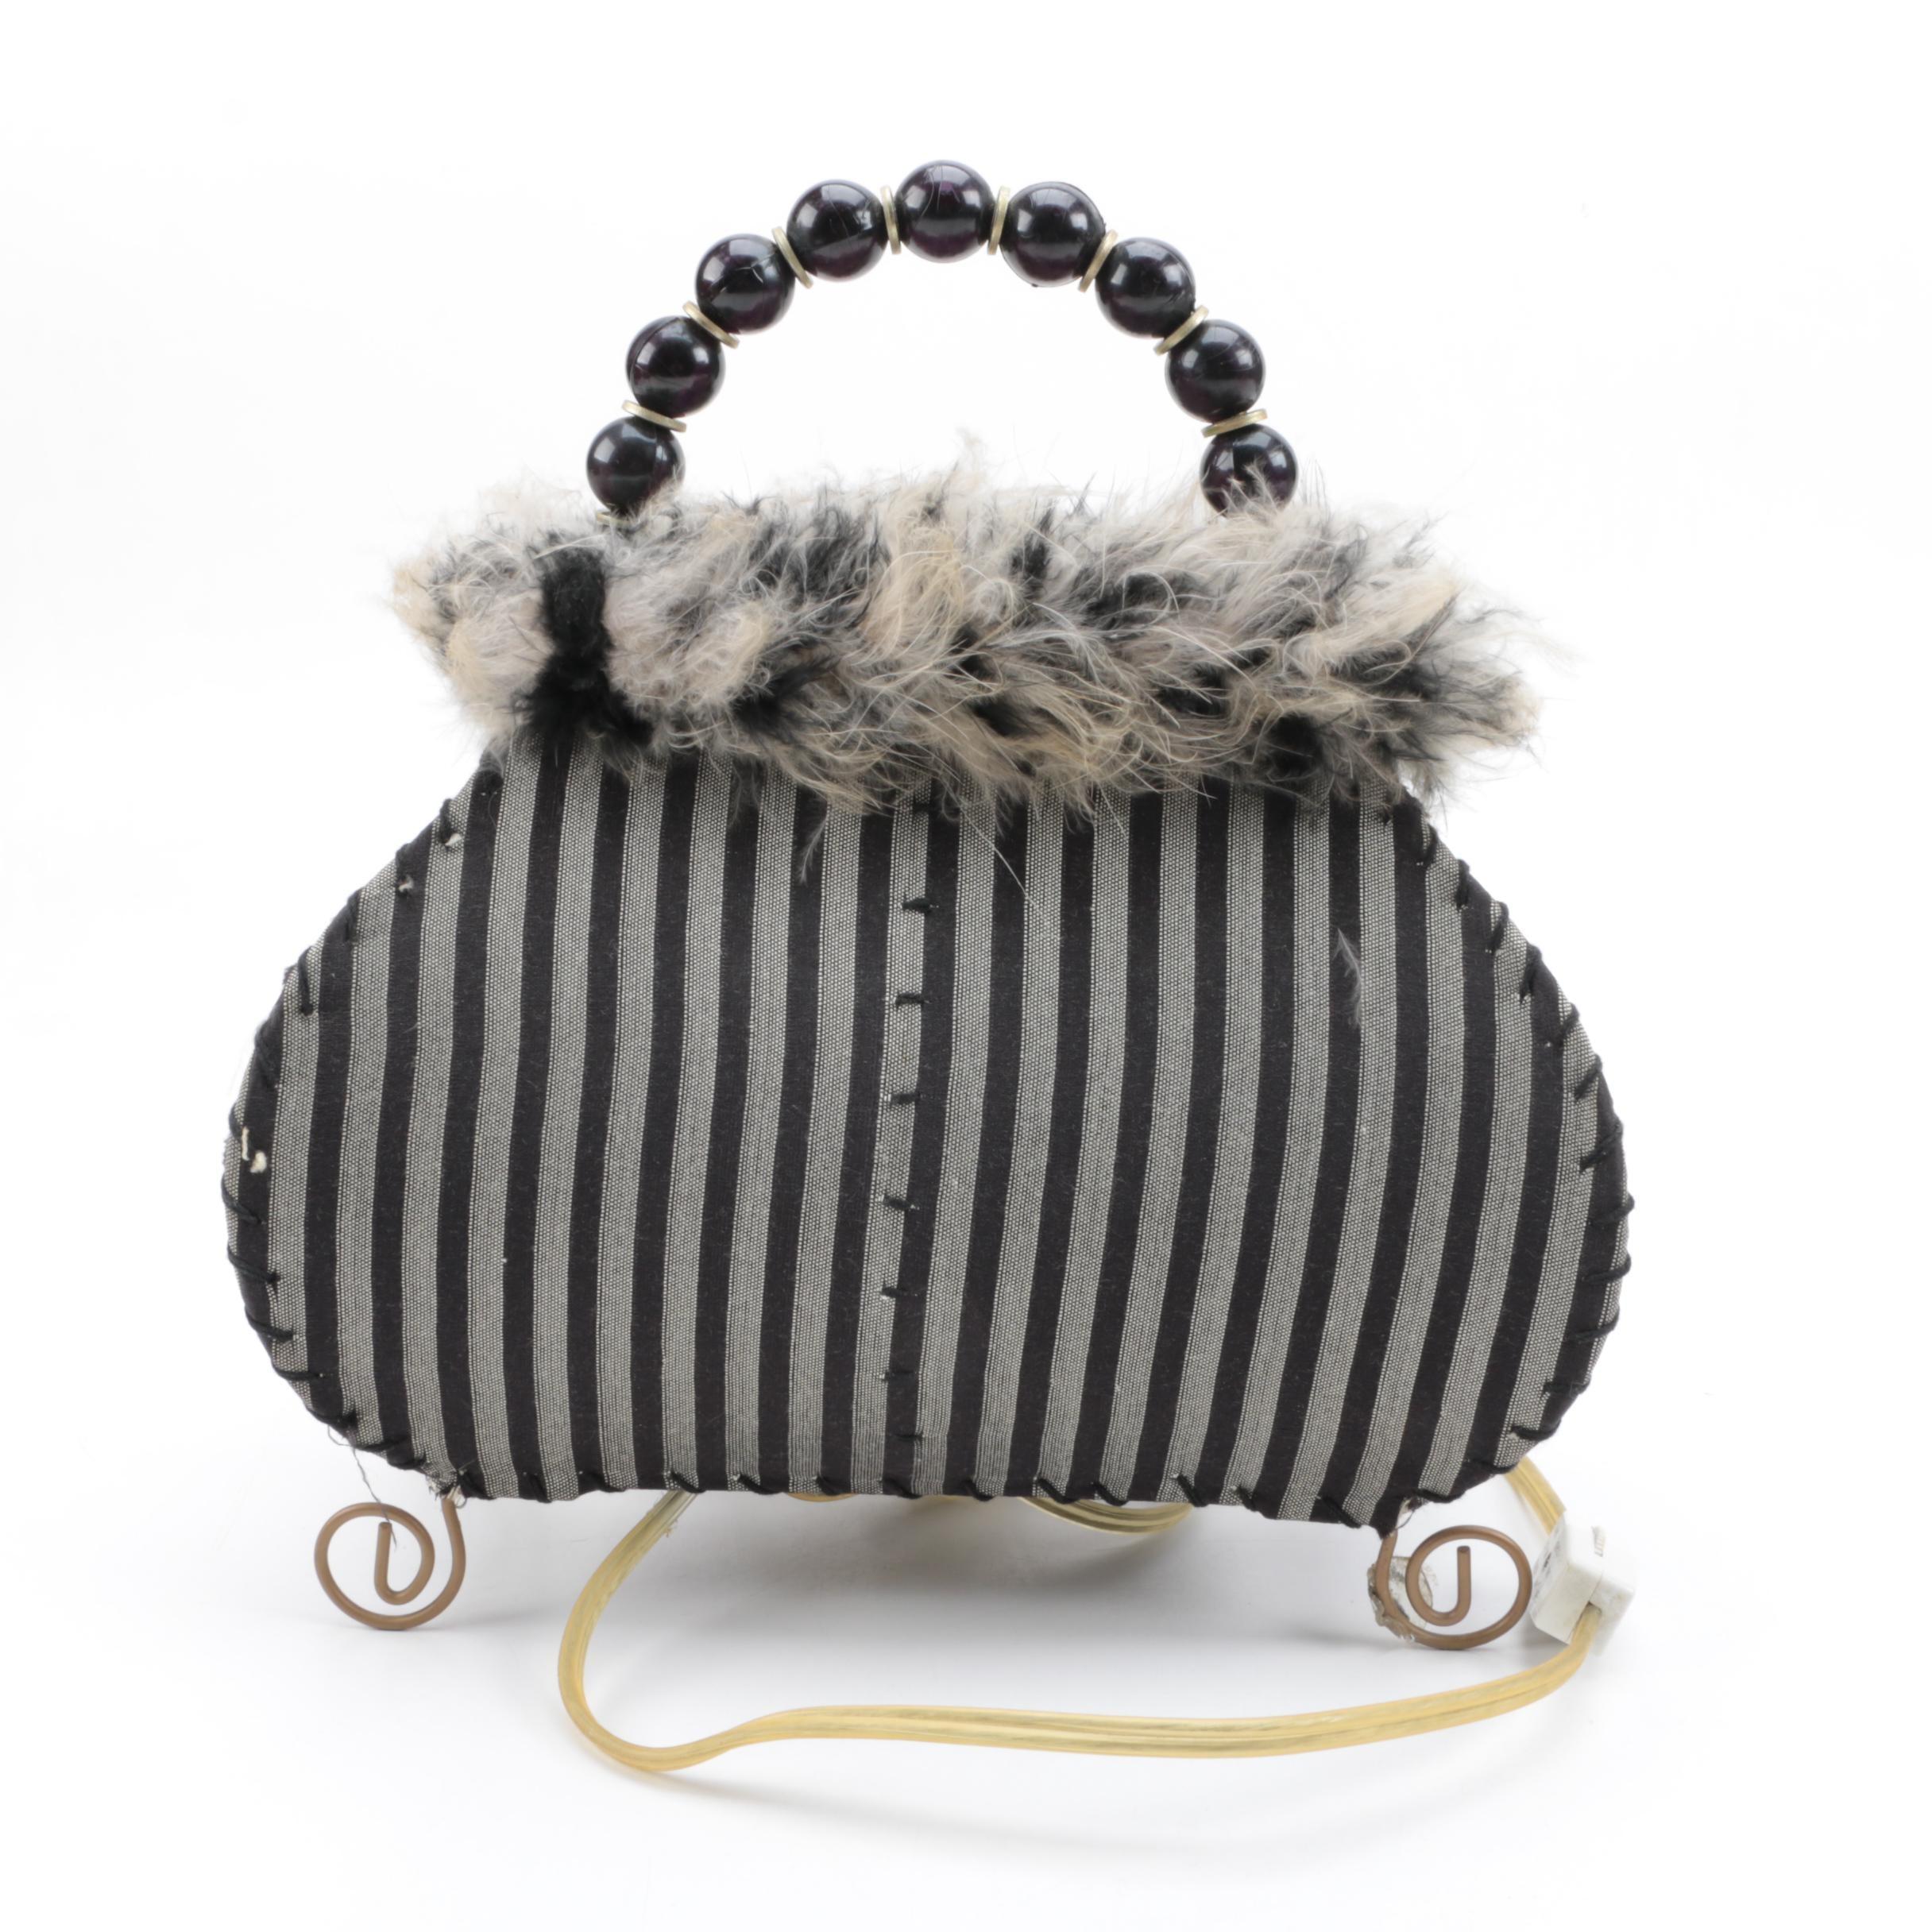 Novelty Handbag Accent Lamp